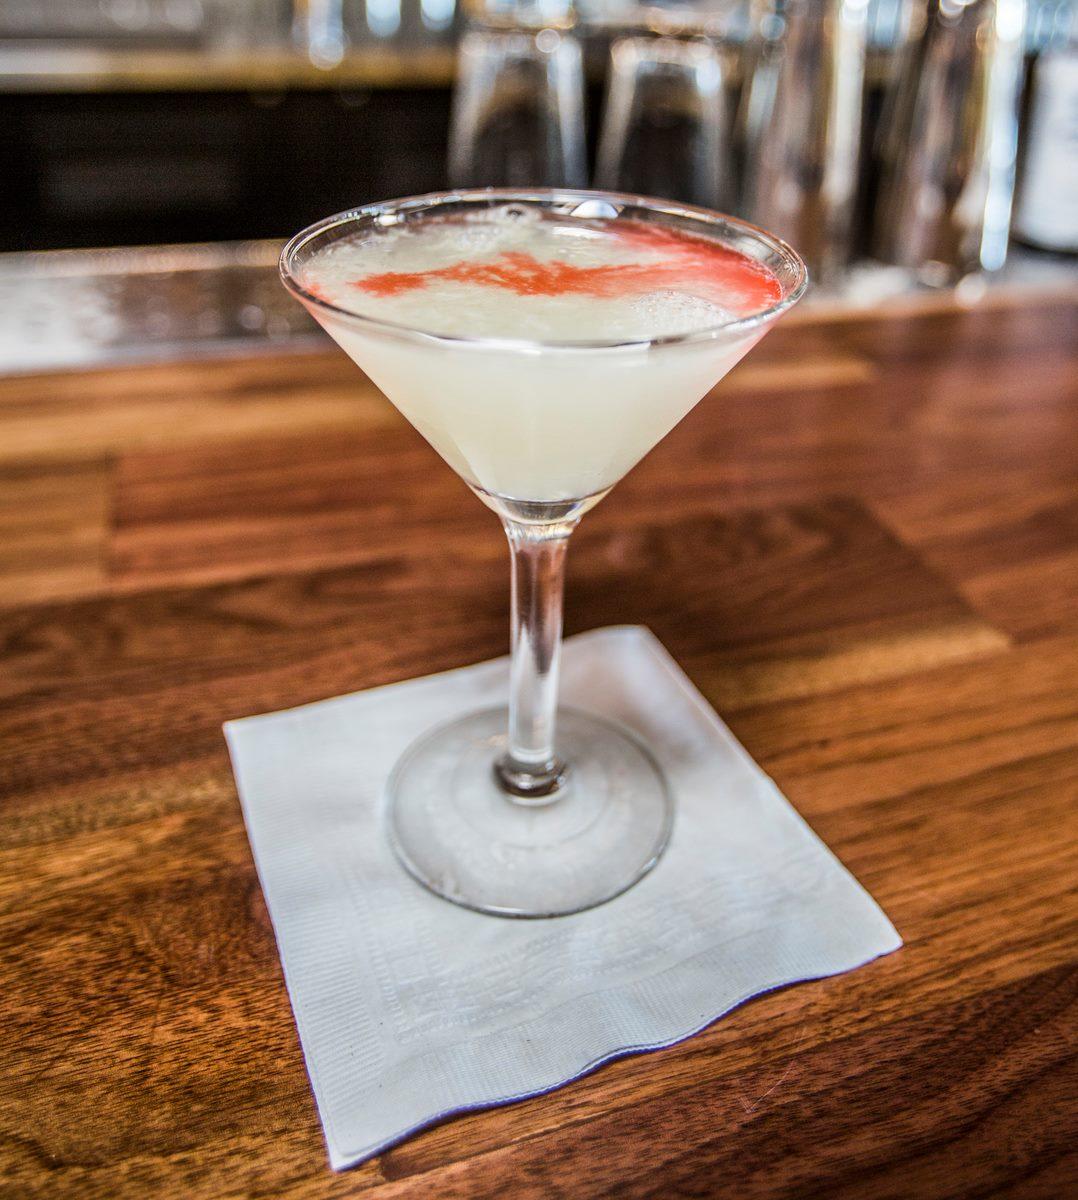 SP2 Communal Bar and Restaurant Celebrates Grand Opening